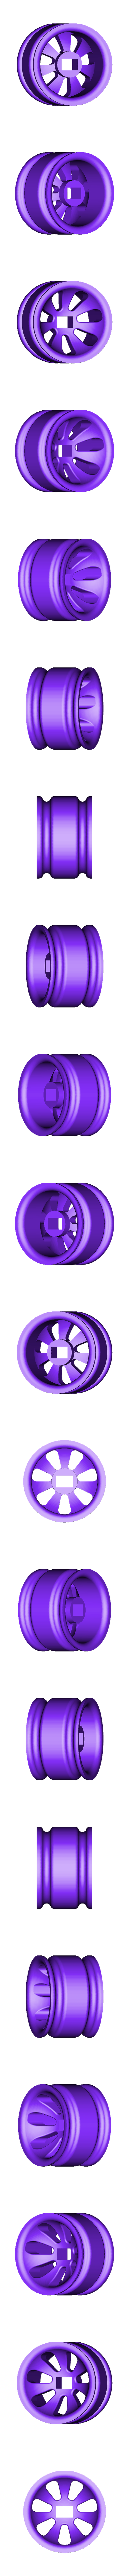 rim_2mm_offset.stl Download free STL file Orlandoo Hunter crawler wider rims • 3D printing model, VICLER